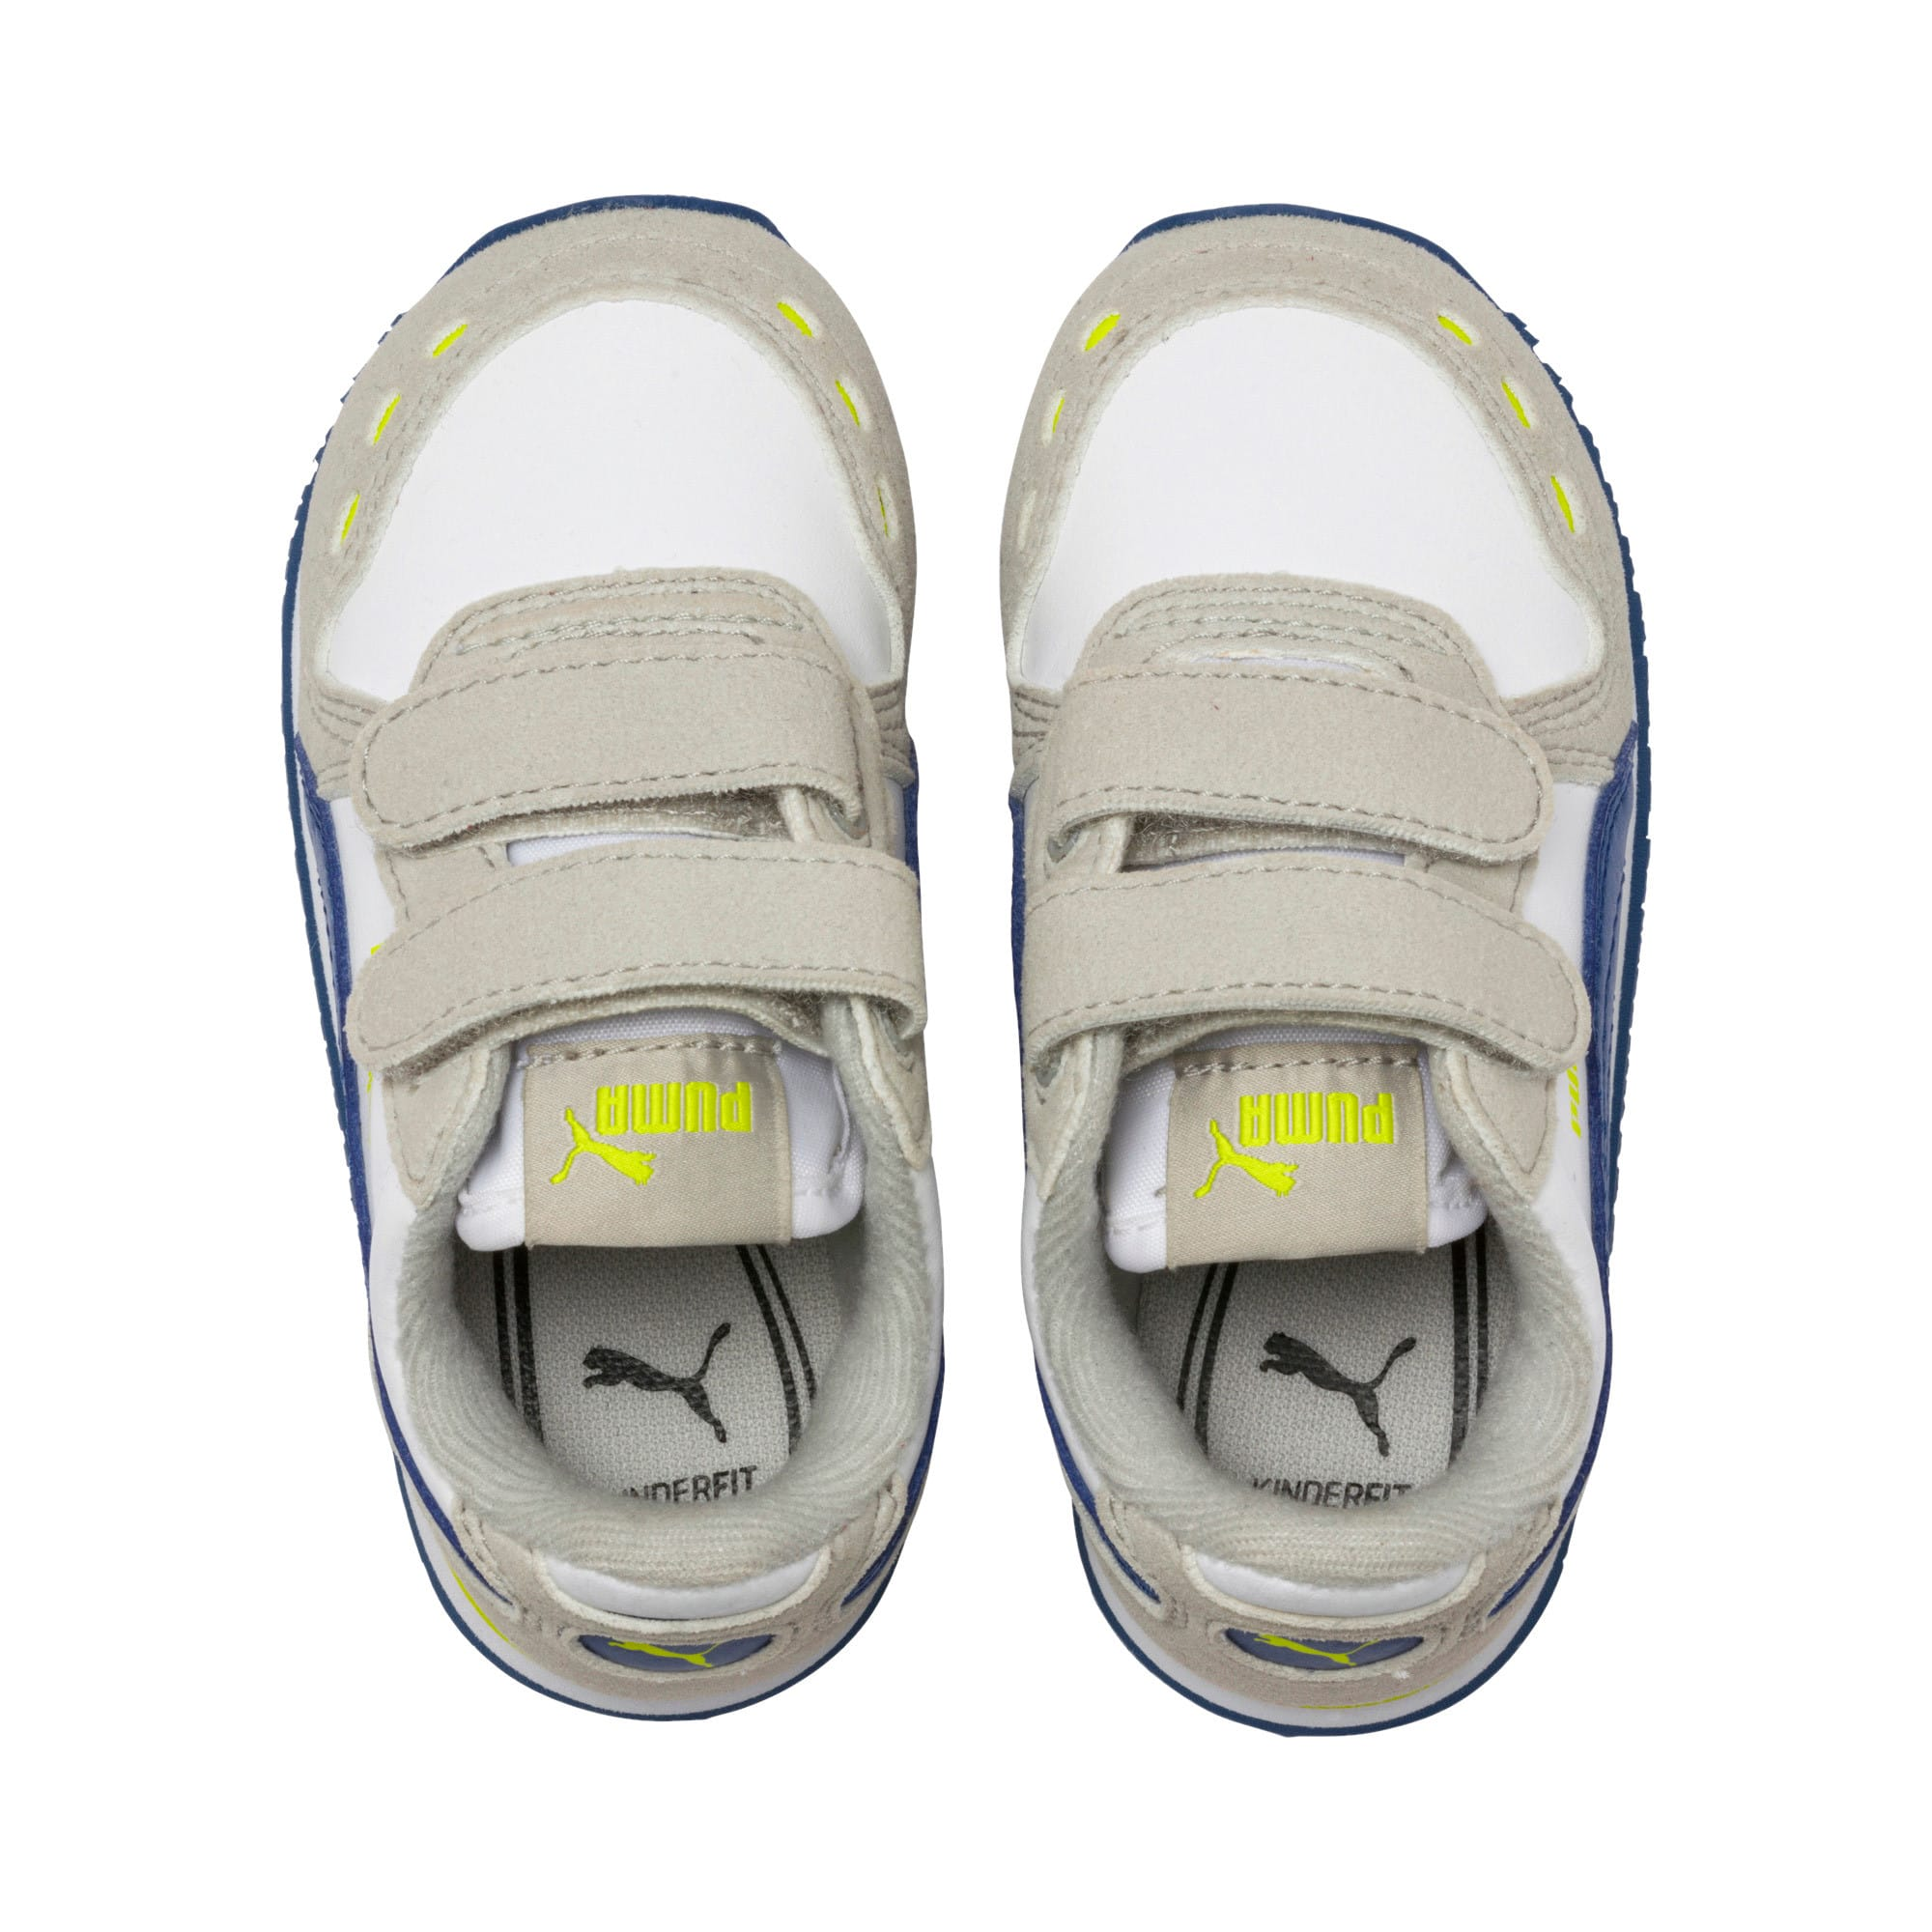 Thumbnail 6 of Cabana Racer SL Toddler Shoes, Puma White-Galaxy Blue, medium